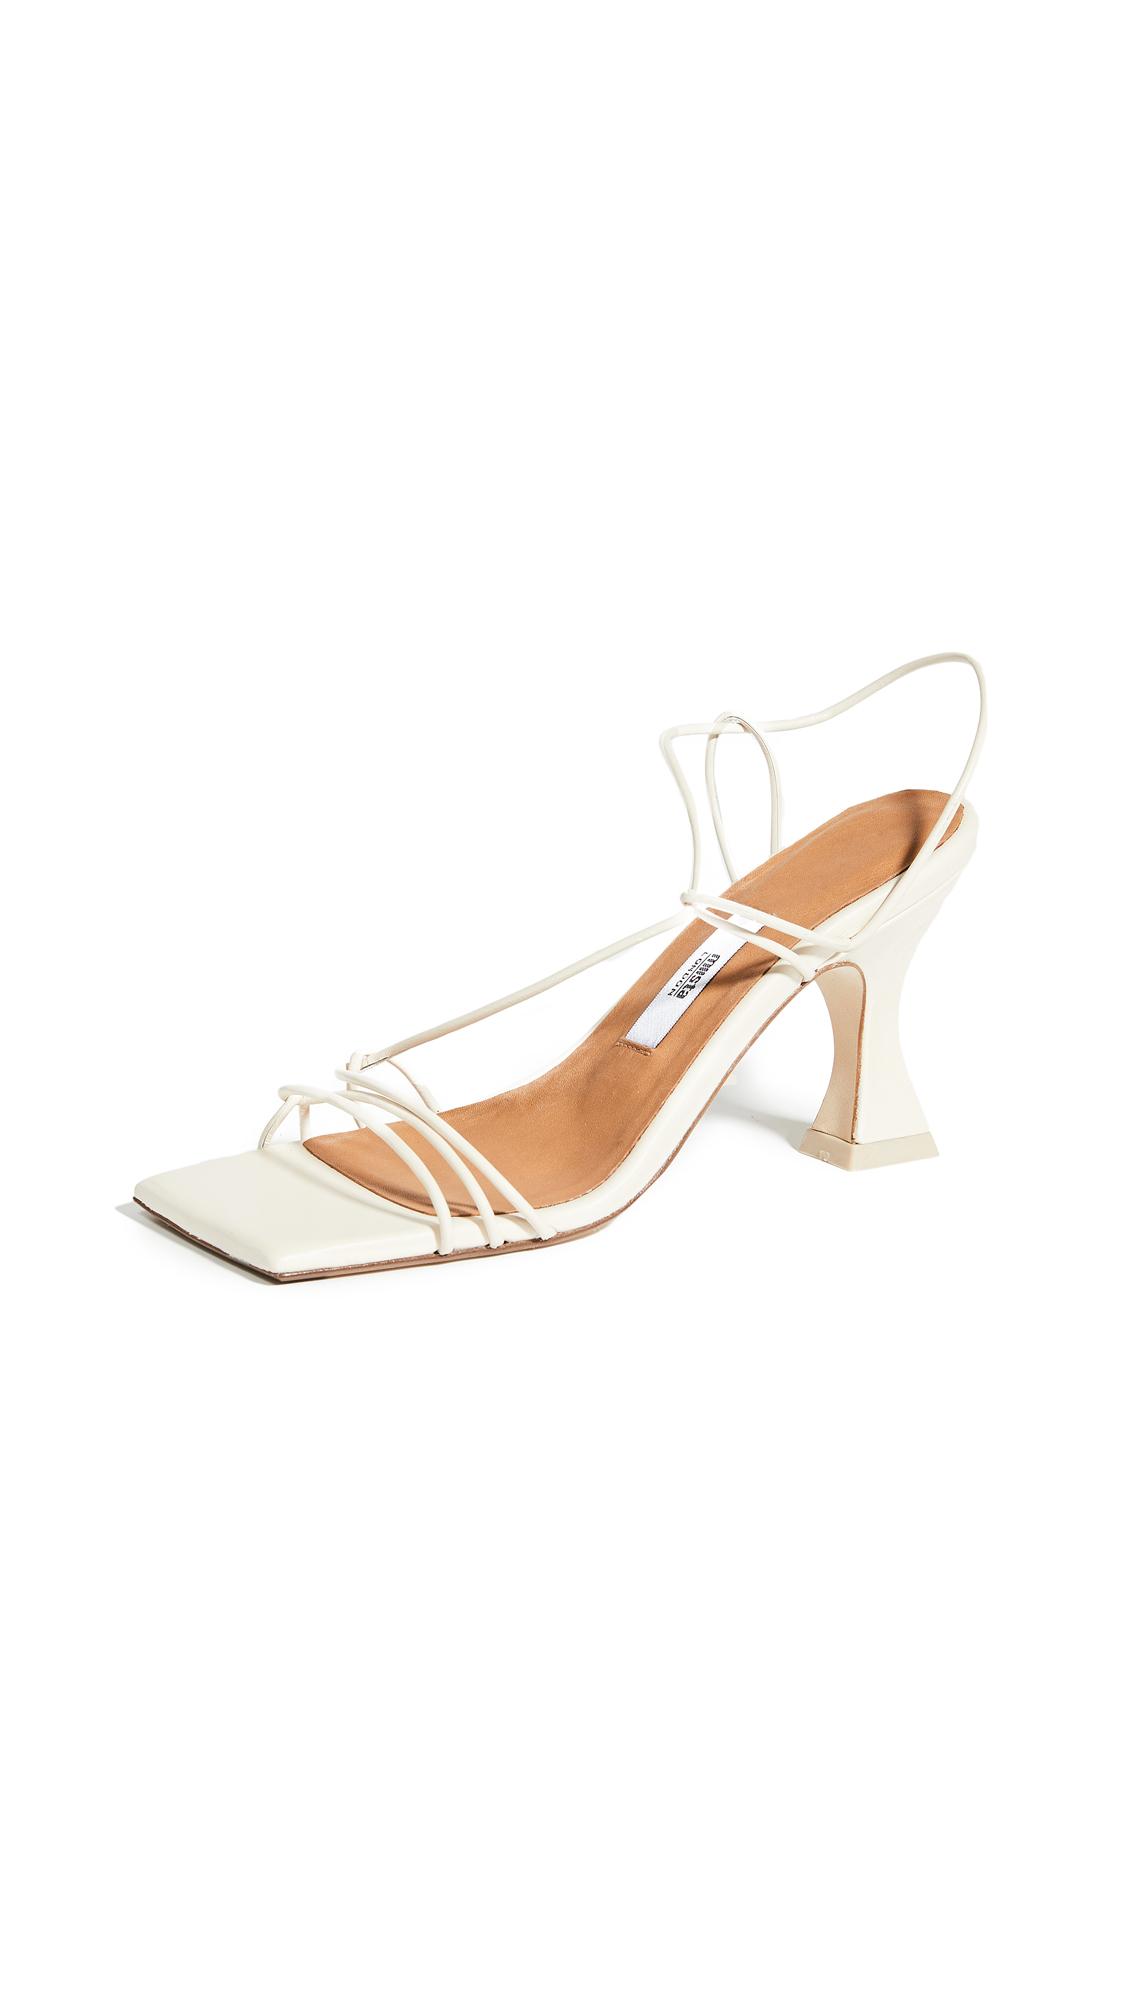 Miista Sally Crab Sandals